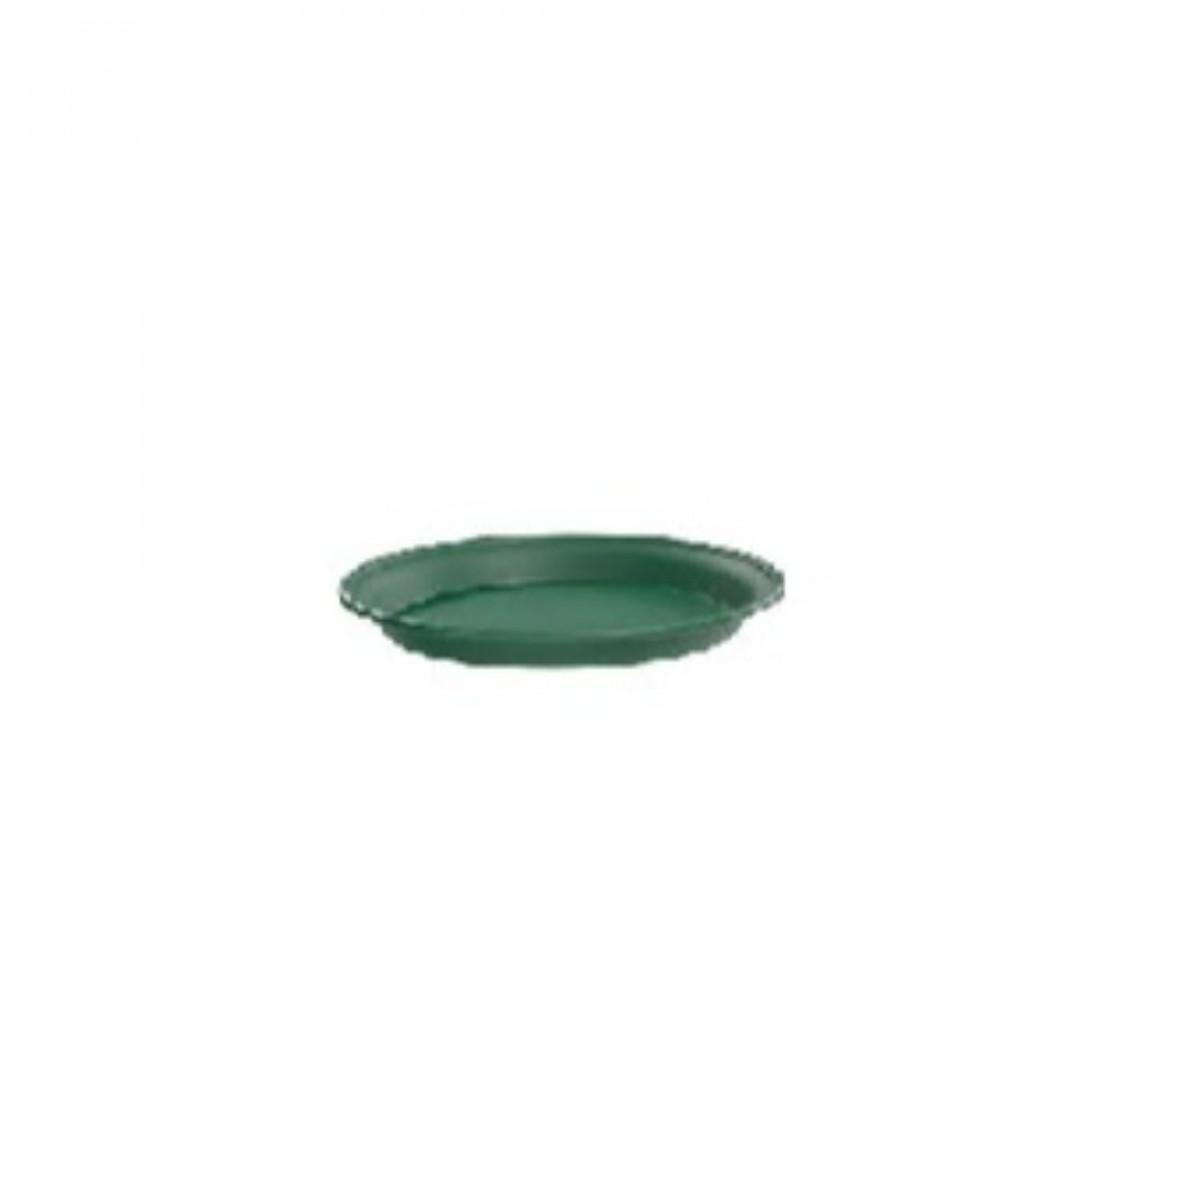 14CM Plastic Tray Green - 10 No